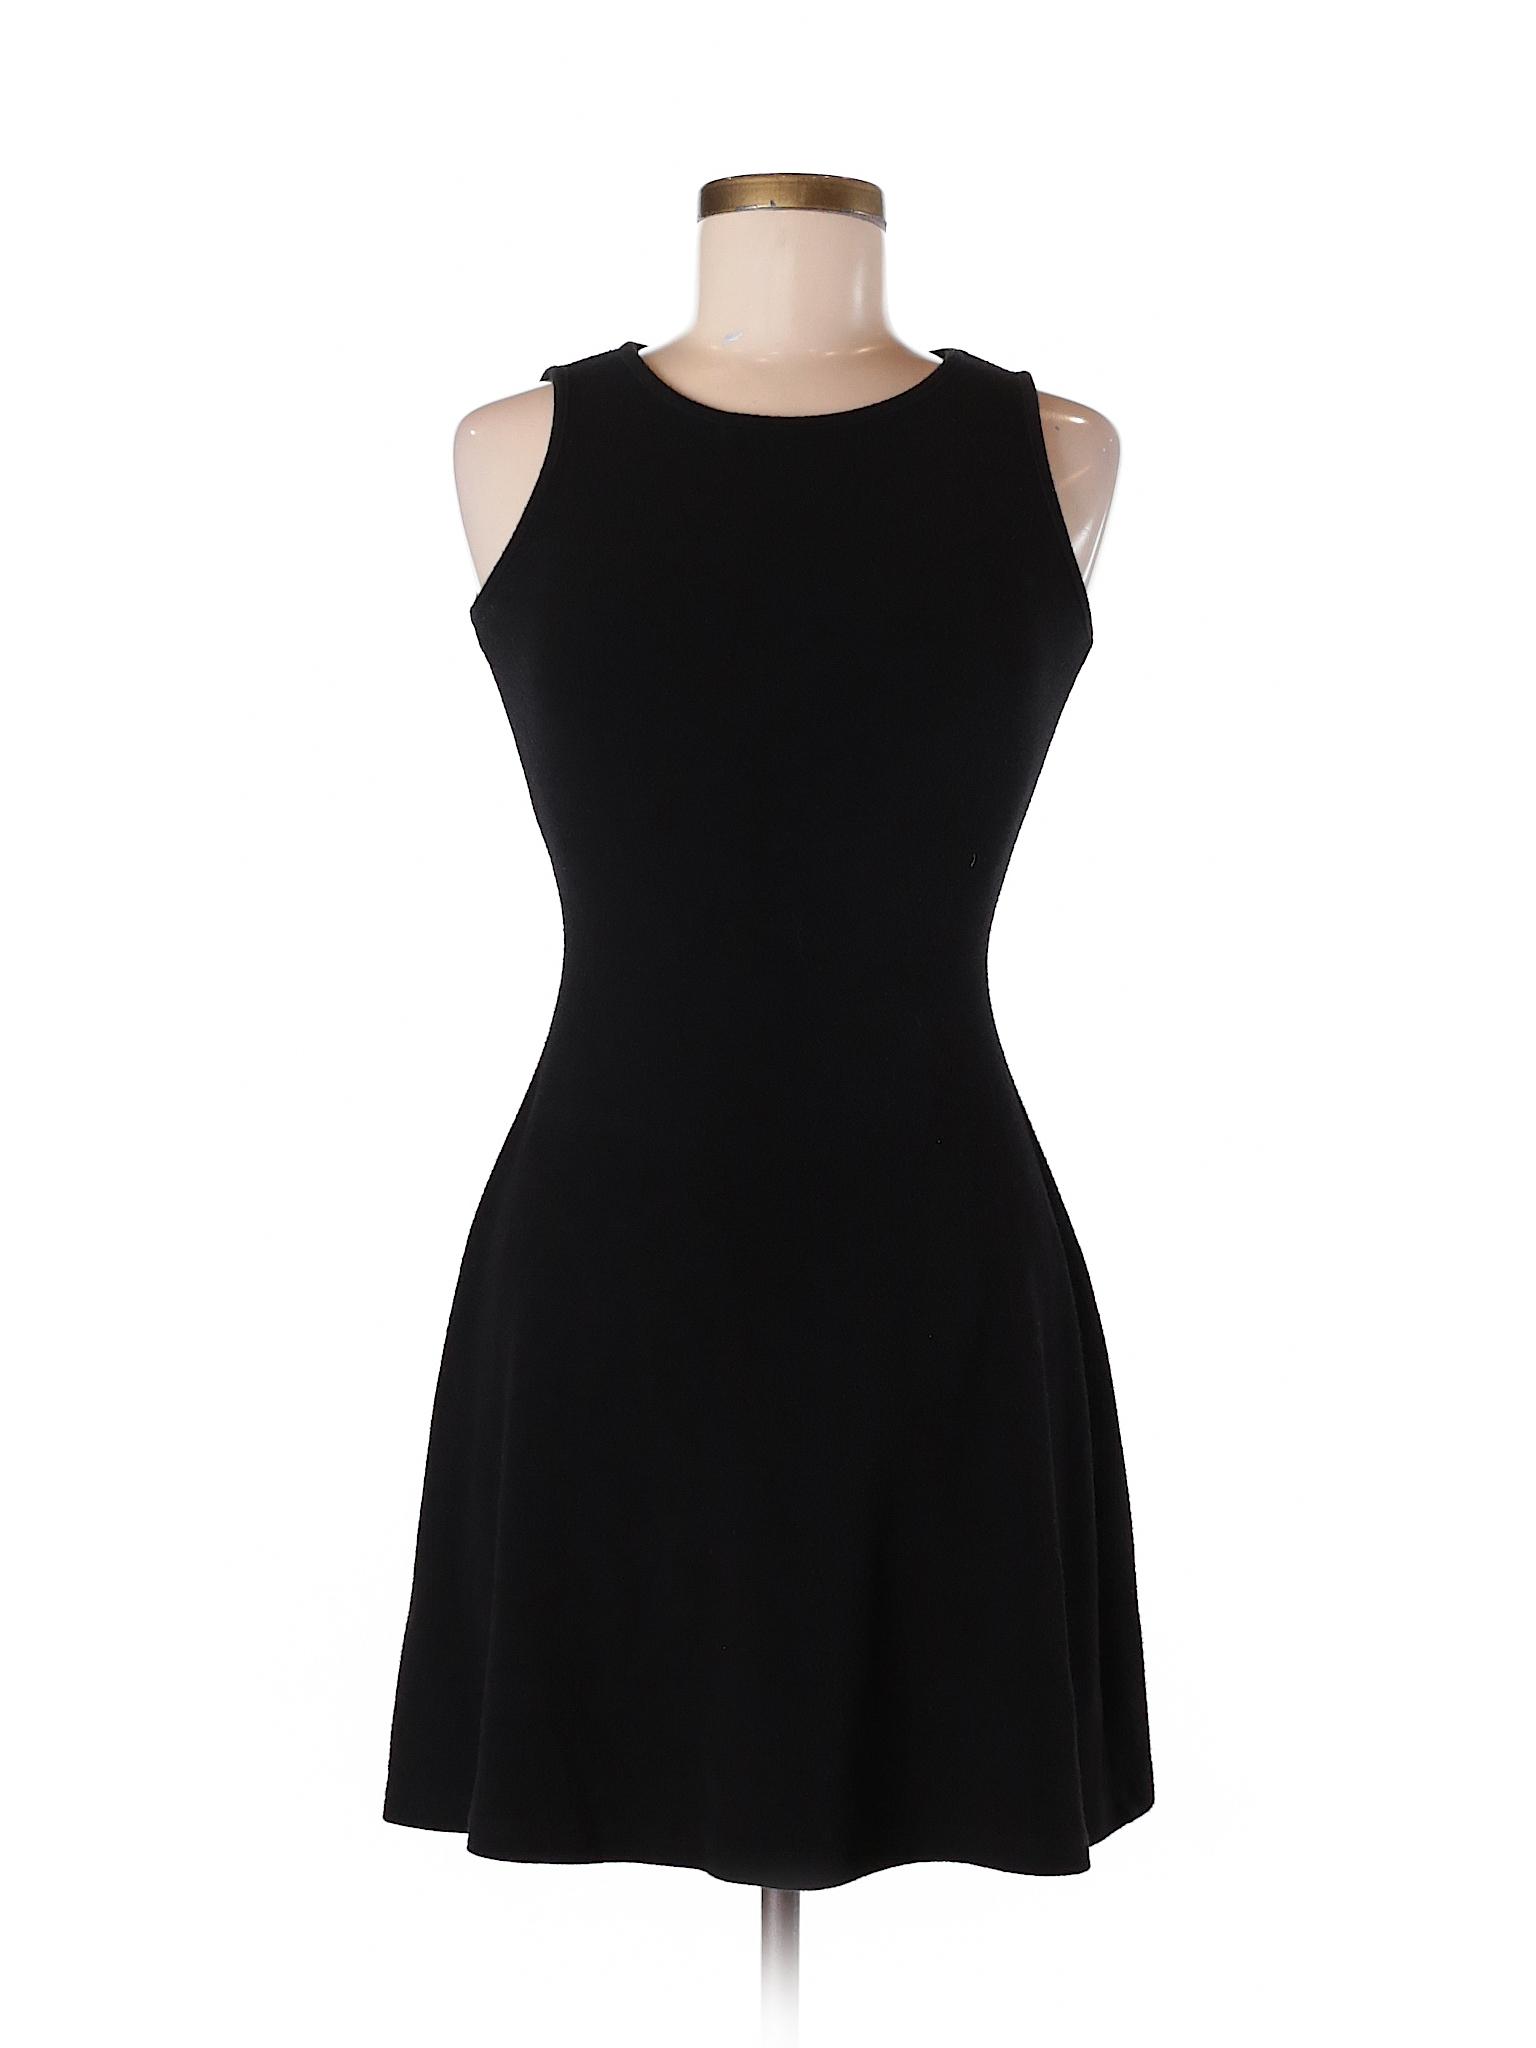 Dress Selling Selling Gracia Casual Gracia wqOazFw